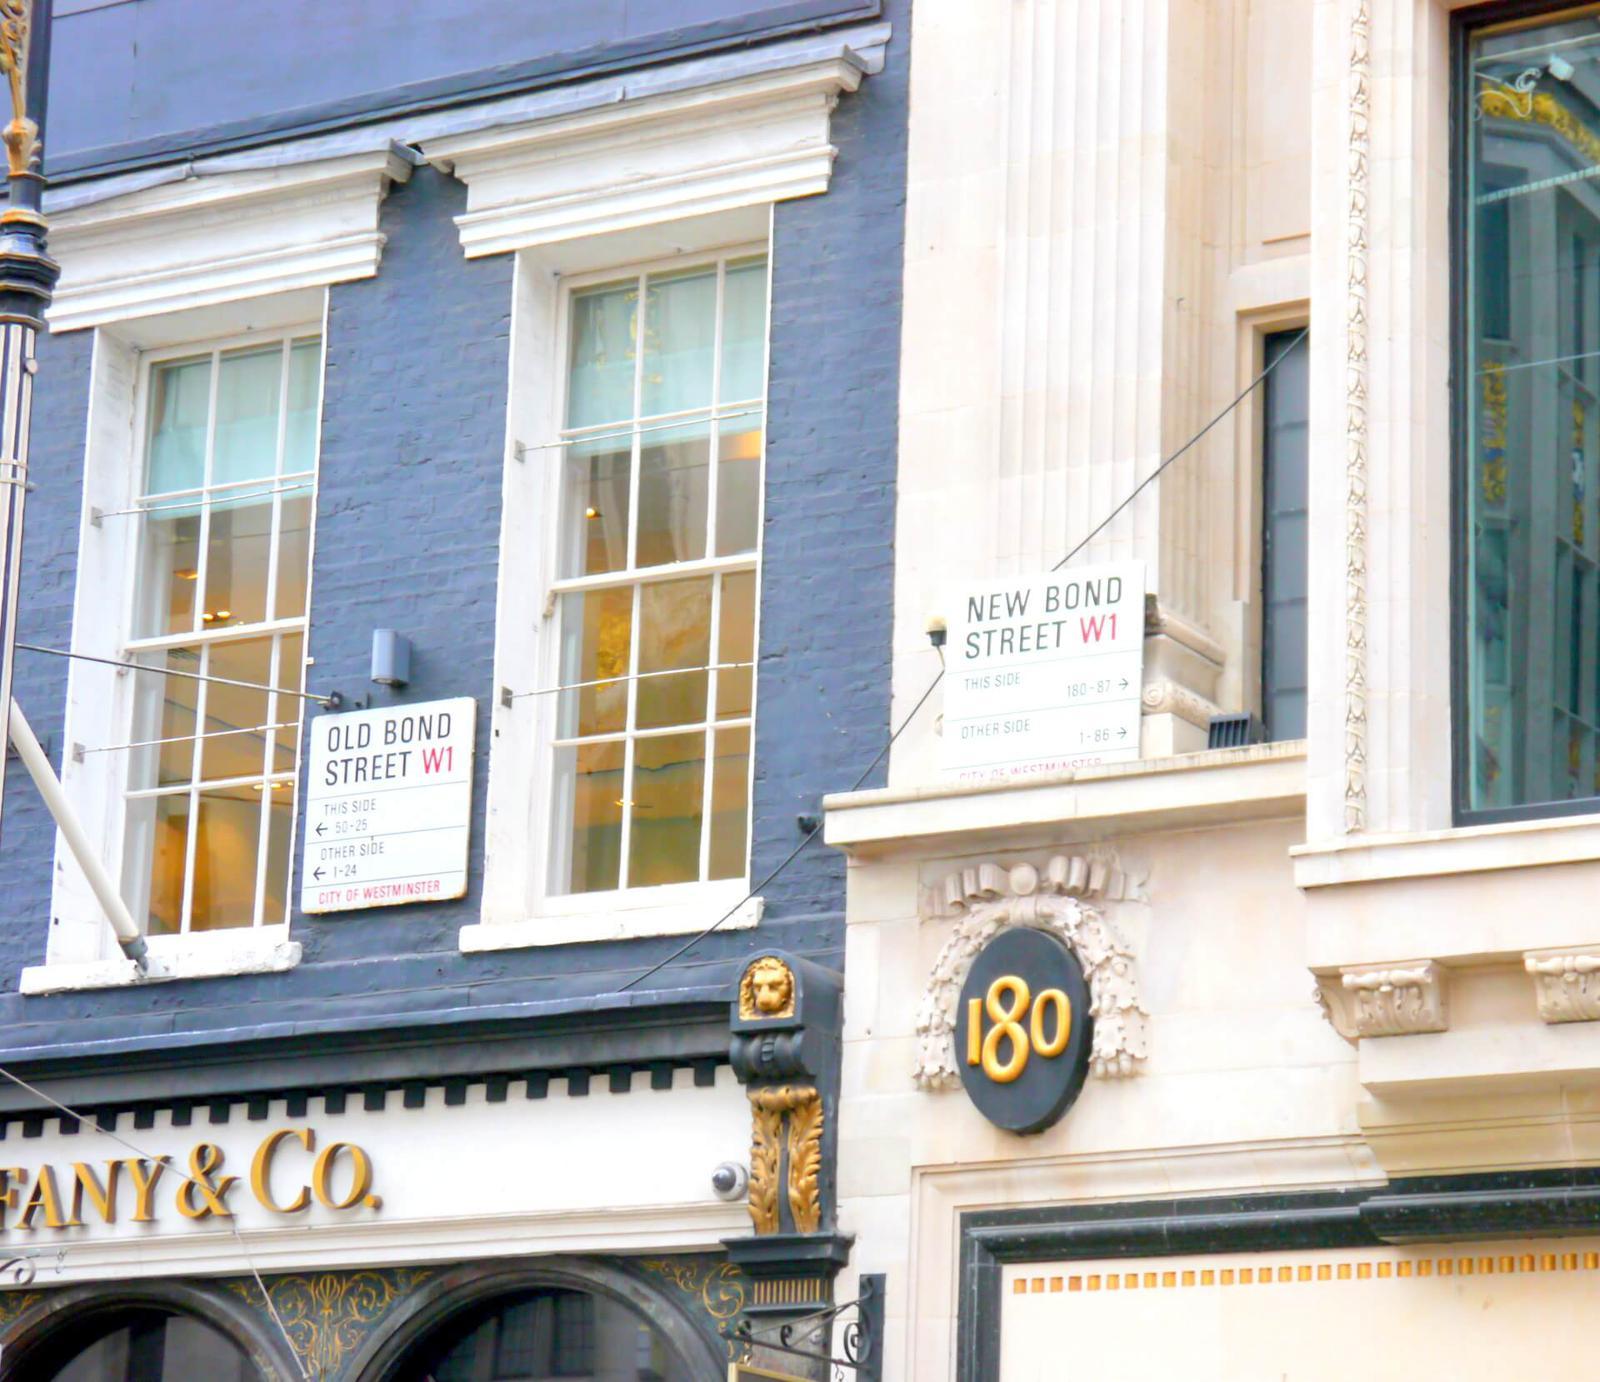 Old Bond Street - New Bond Street